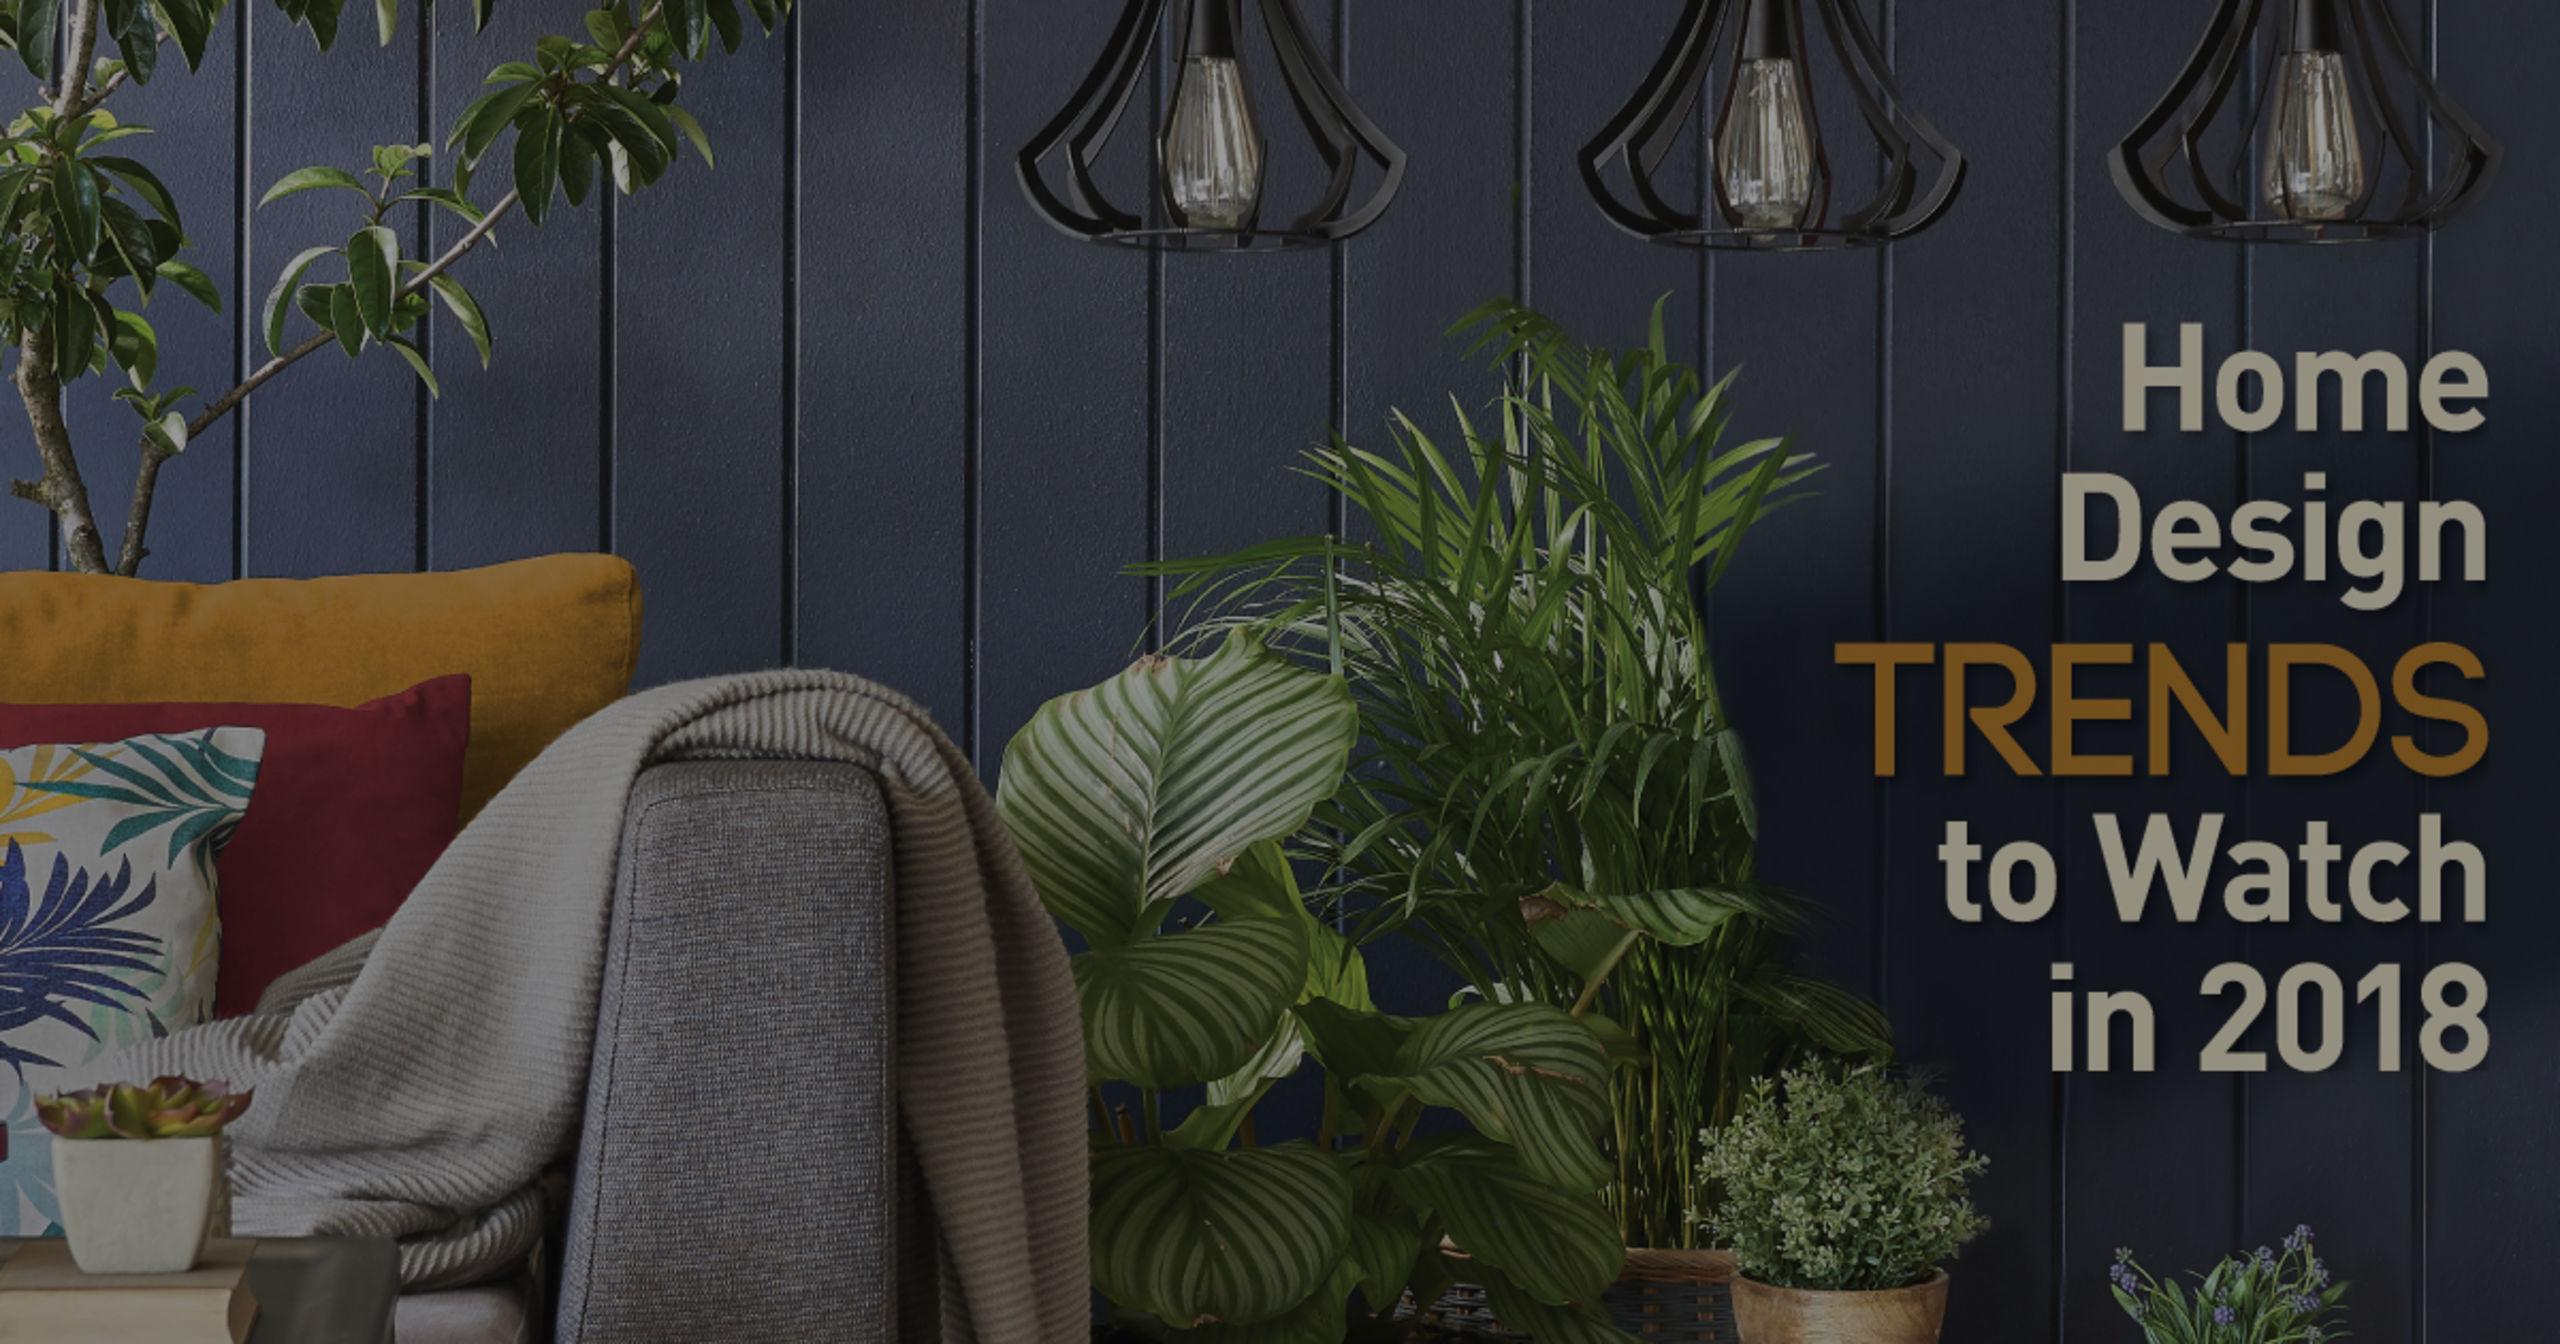 Hottest Home Design Trends for 2018